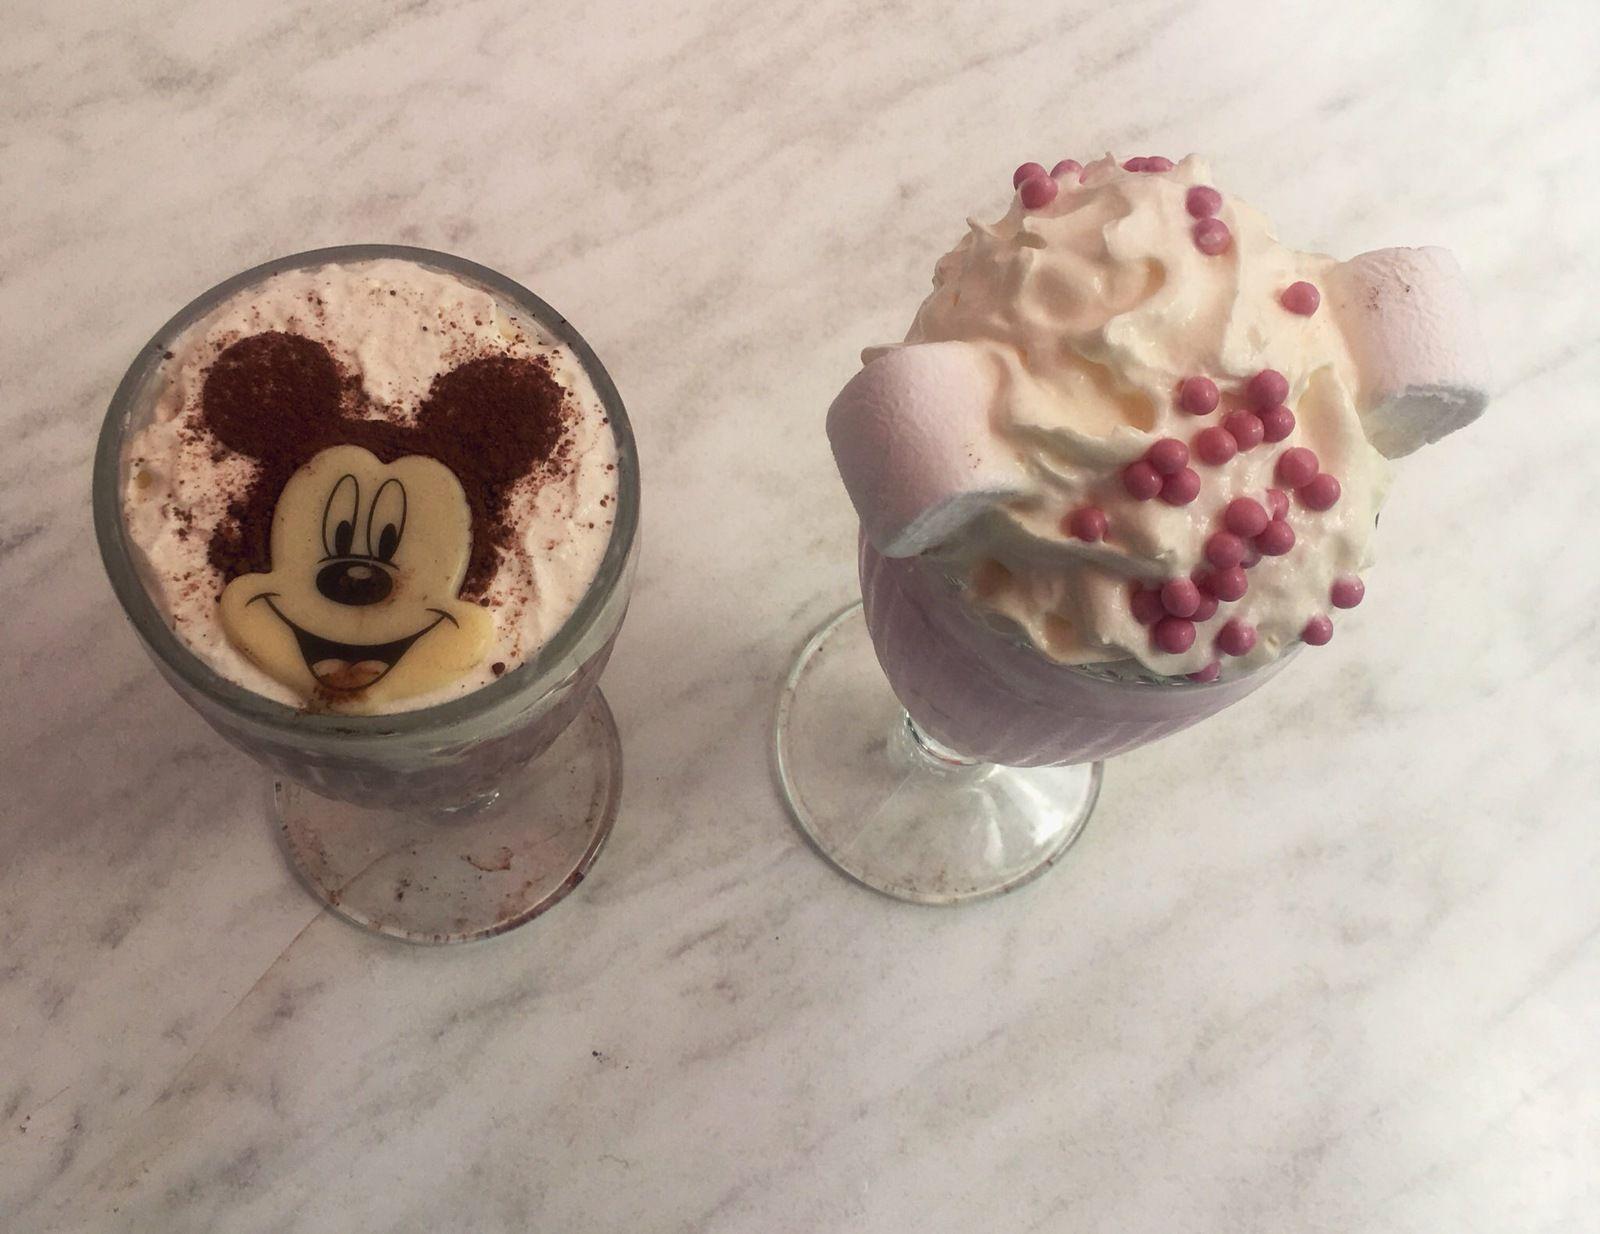 Les restaurants de Main Street U.S.A à Disneyland Paris